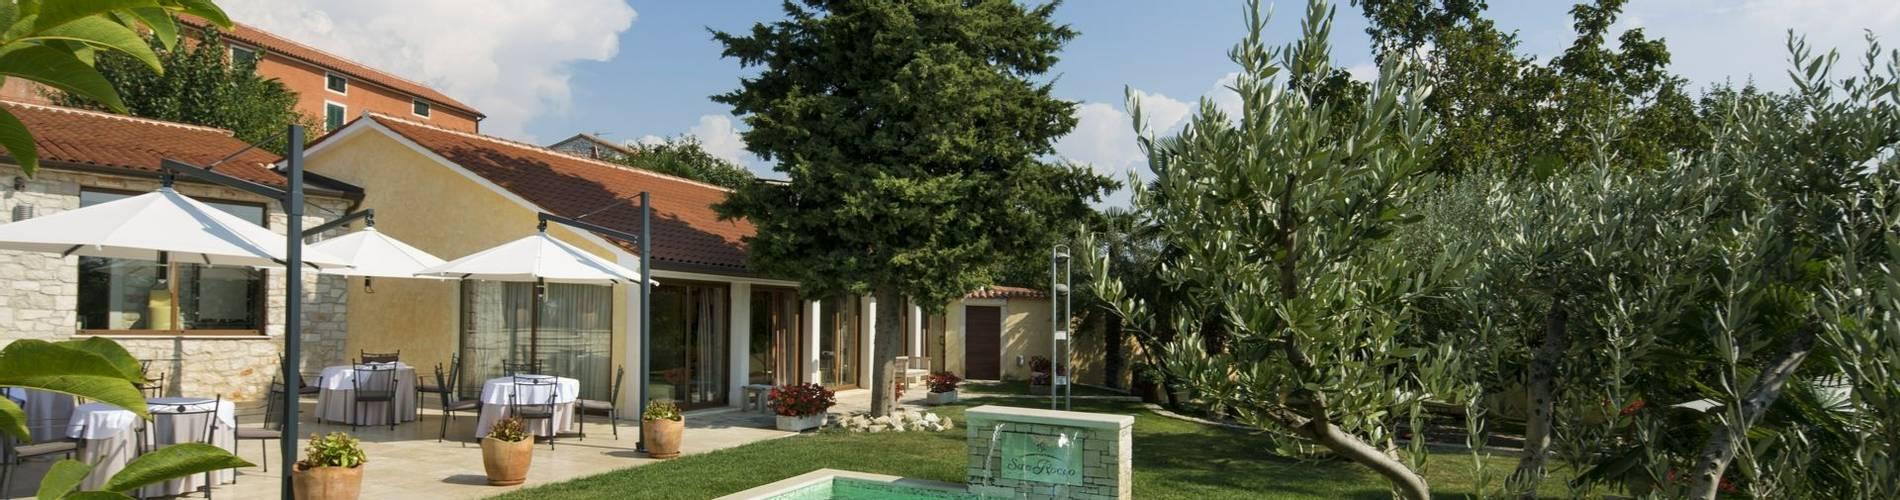 Heritage Hotel San Rocco, Istra, Croatia (16).jpg